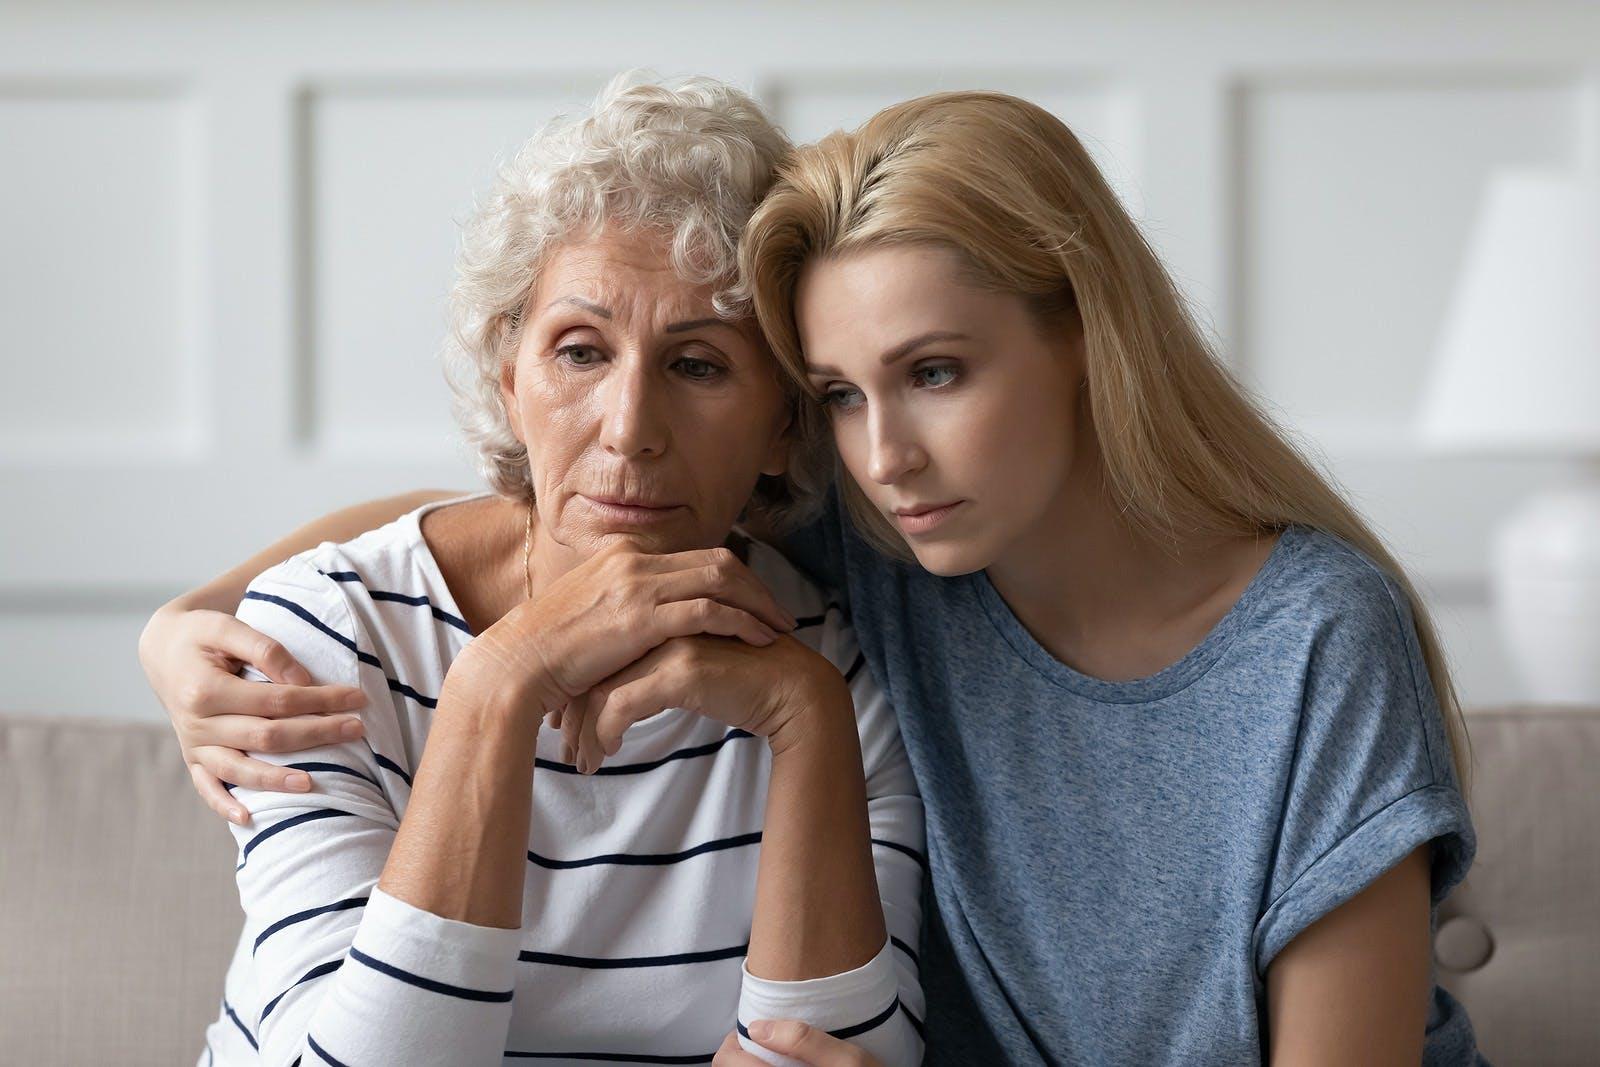 Sad grownup daughter sitting on sofa hugging desperate elderly mother